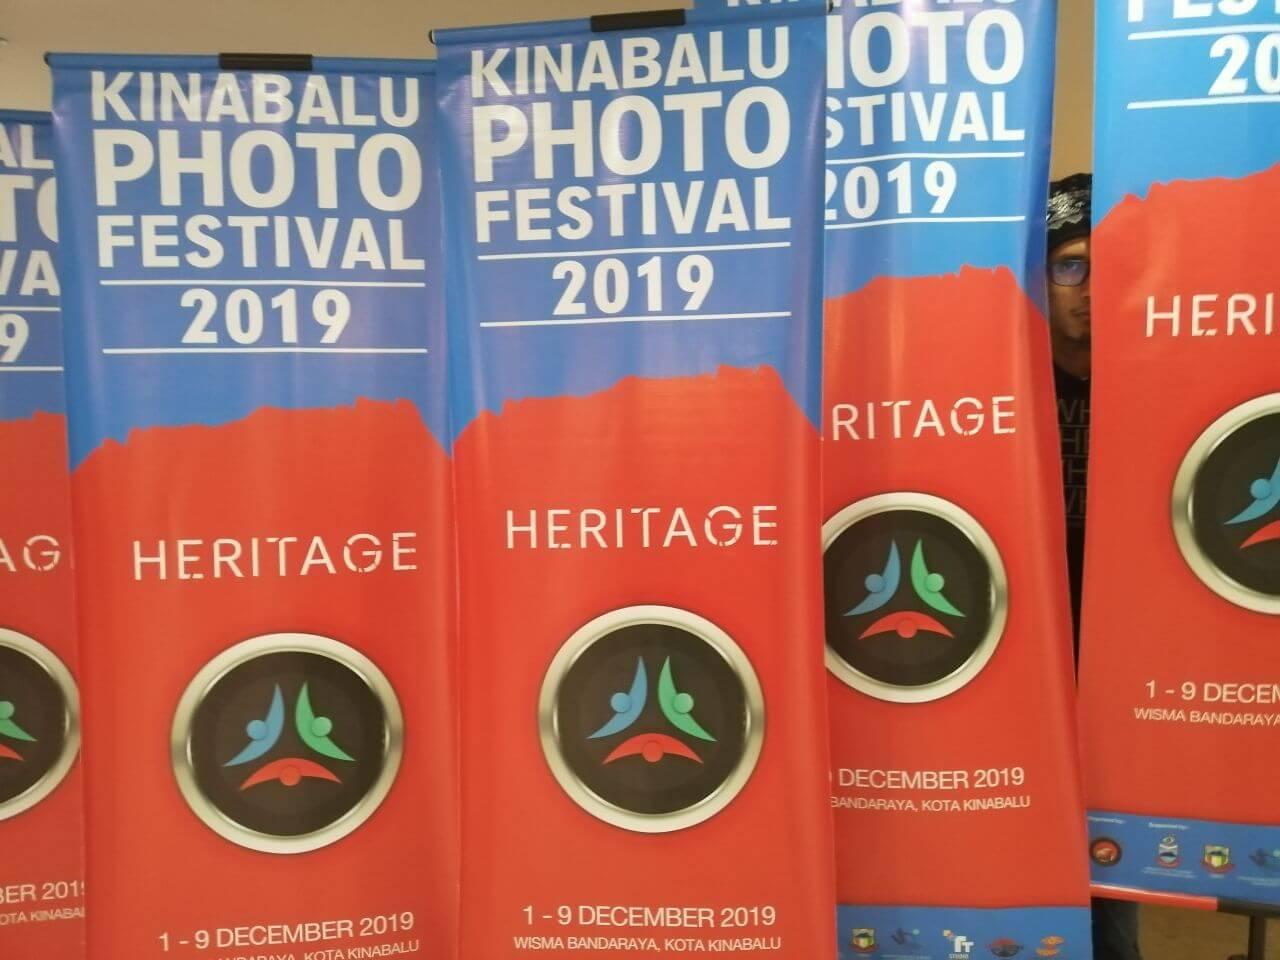 KINABALU PHOTO FESTIVAL 2019 KINABALU PHOTO FESTIVAL